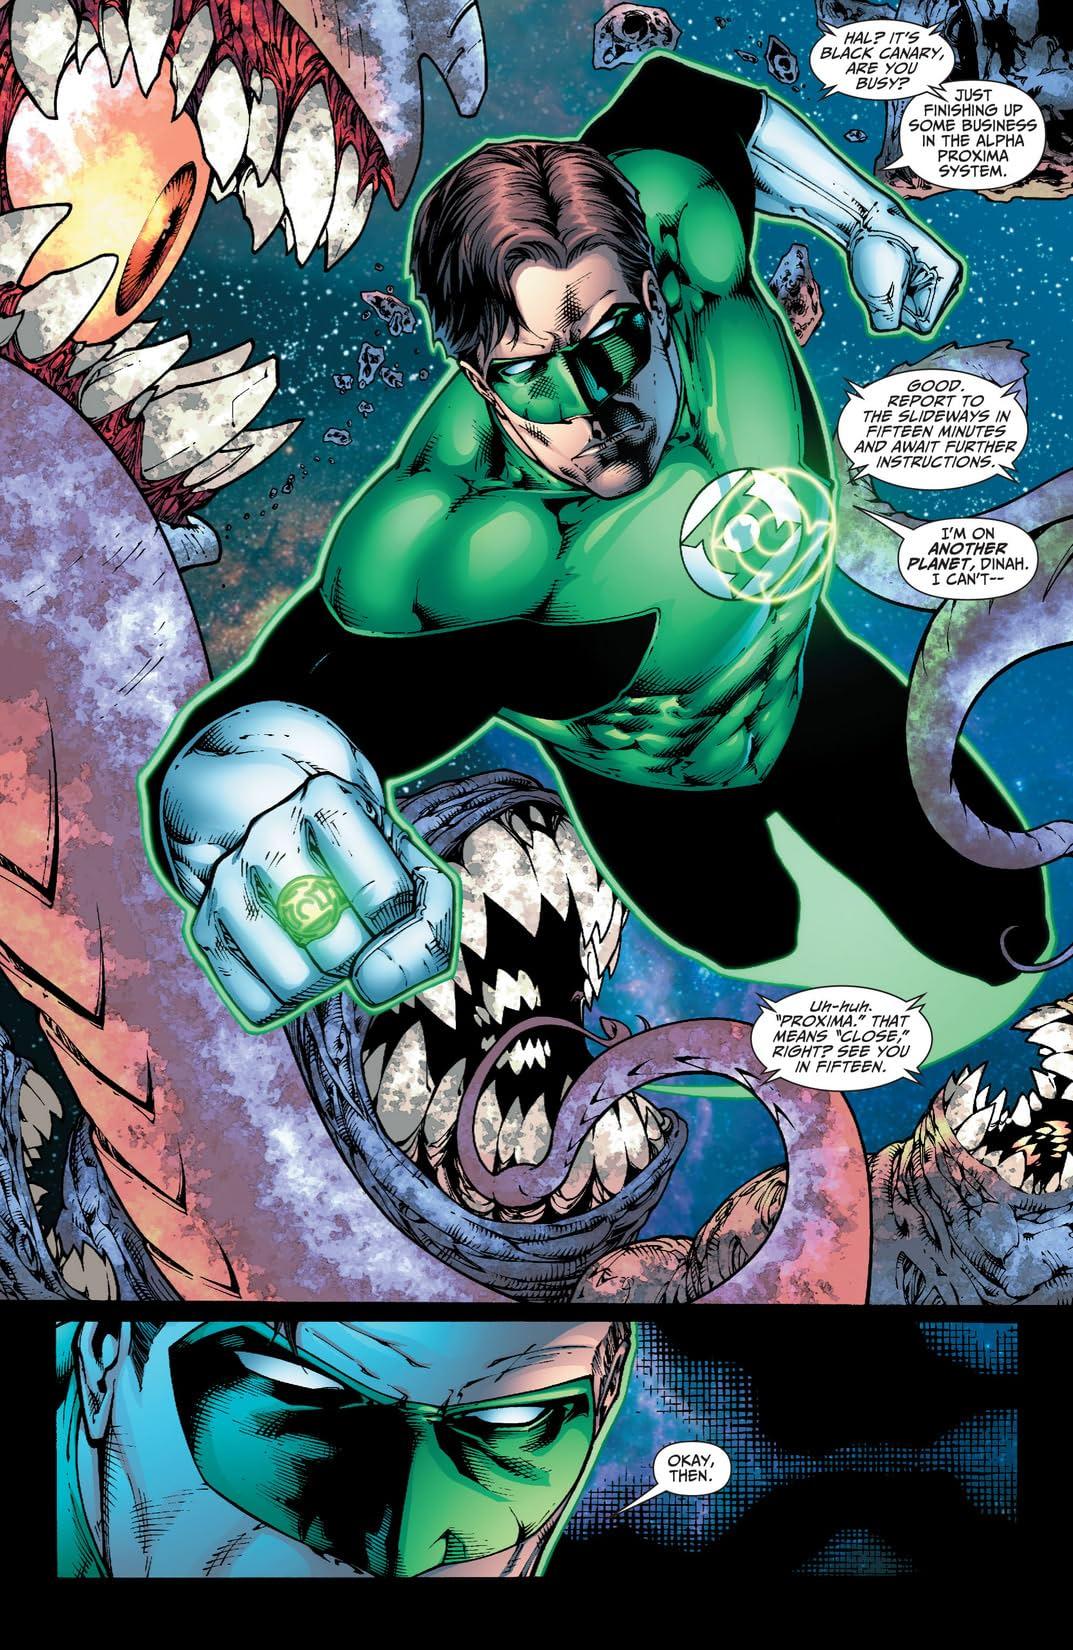 Justice League of America (2006-2011) #31